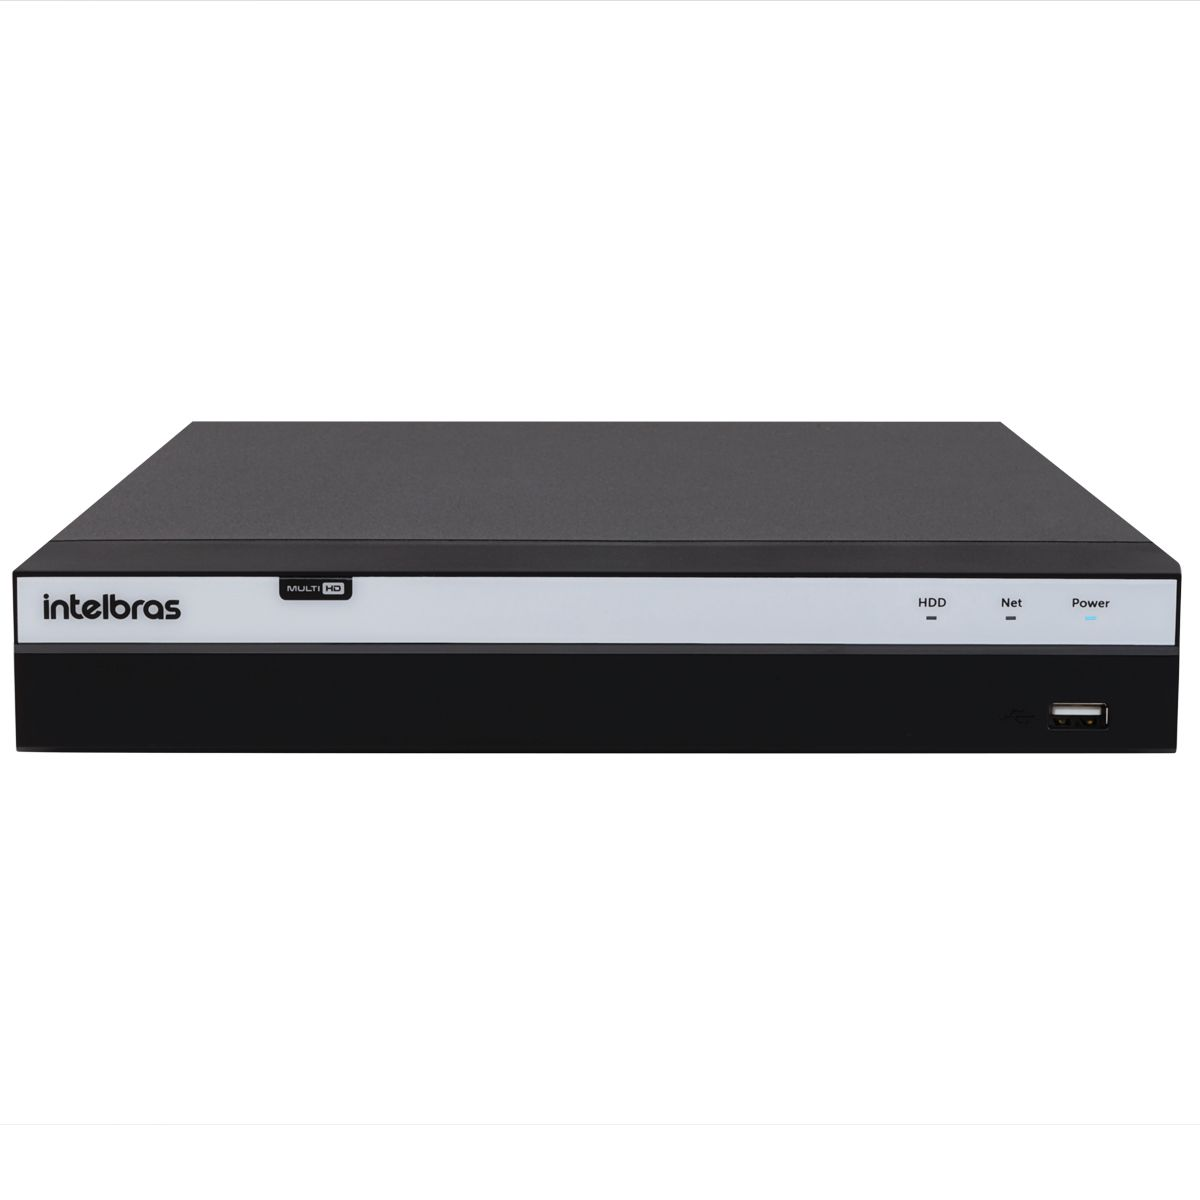 Kit 3 Câmeras de Segurança 4MP 2k Intelbras VHD 3430 B + DVR Intelbras 4K + HD WD Purple + Acessórios  - Tudo Forte